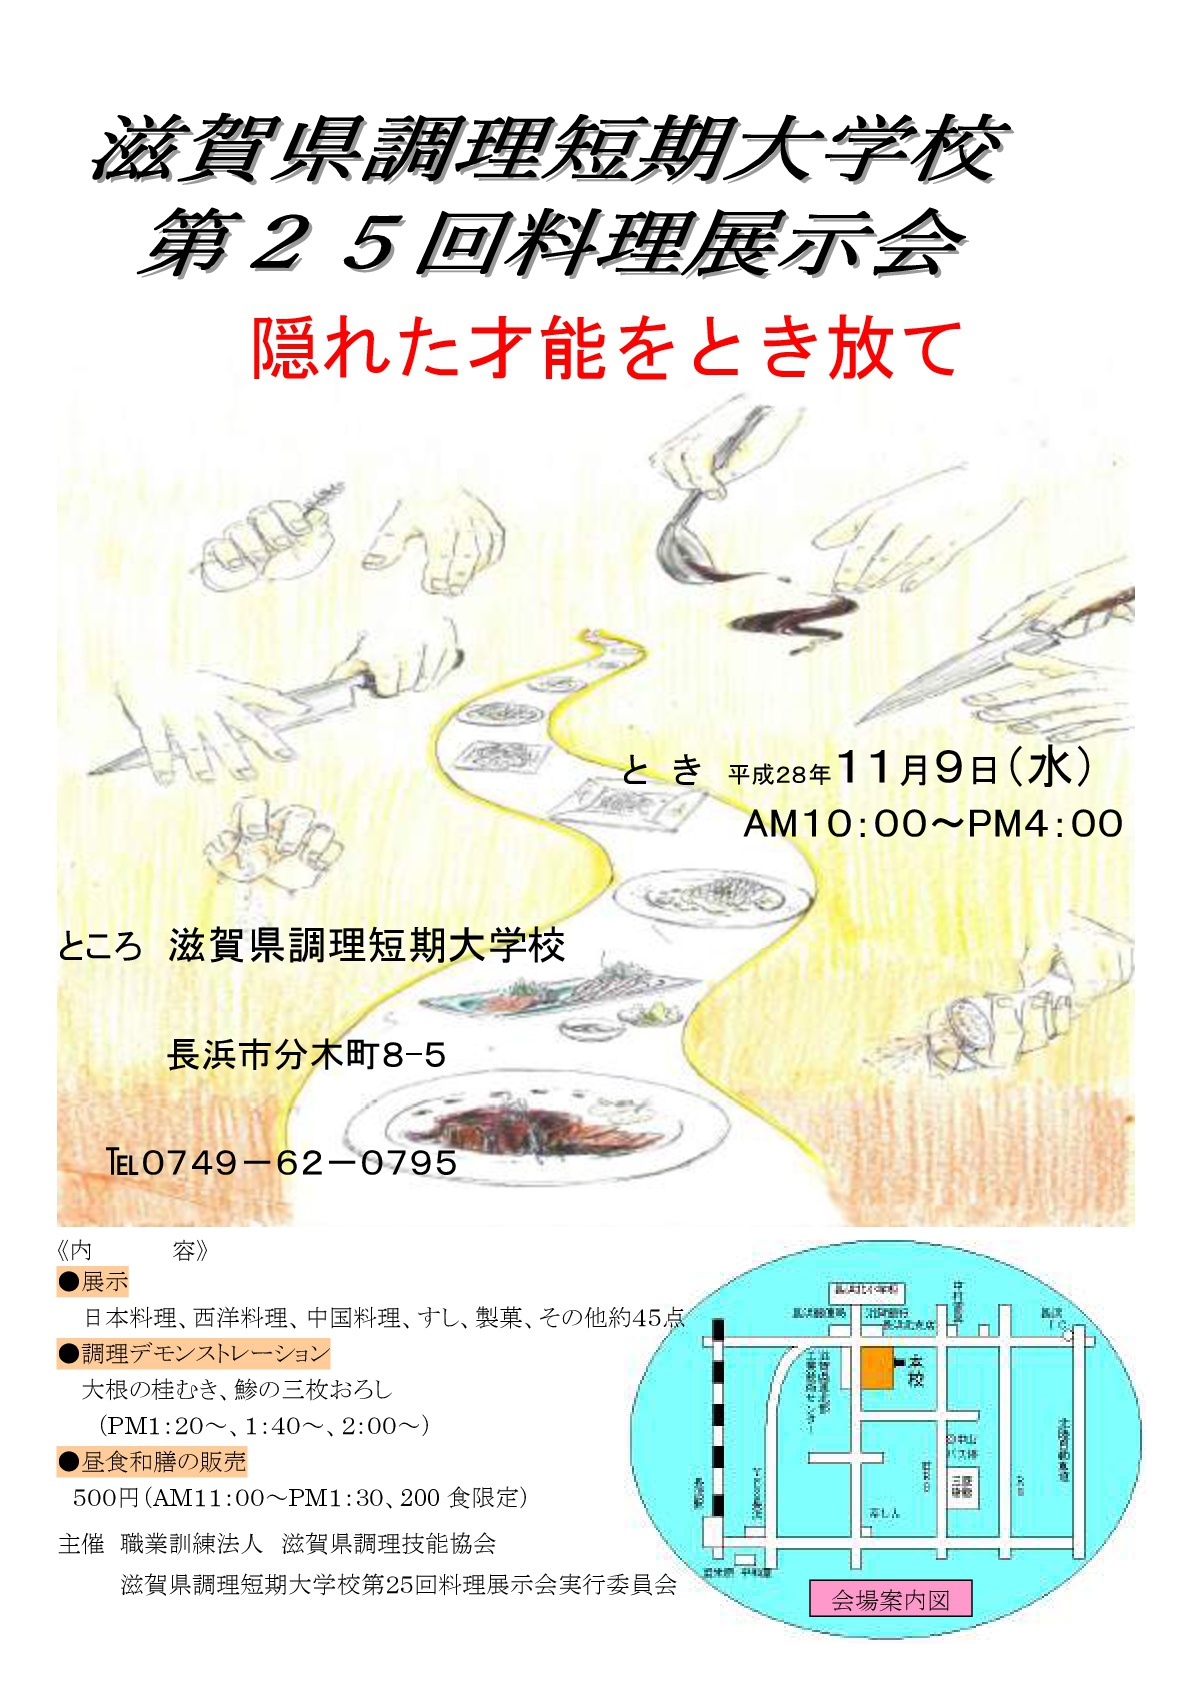 9f7366da3e073 で予告していました、滋賀県調理短期大学校(職業訓練法人  滋賀県調理技能協会)の第25回料理展示会のご案内です。絵は、滋賀県調理短期大学校の生徒によるものです。